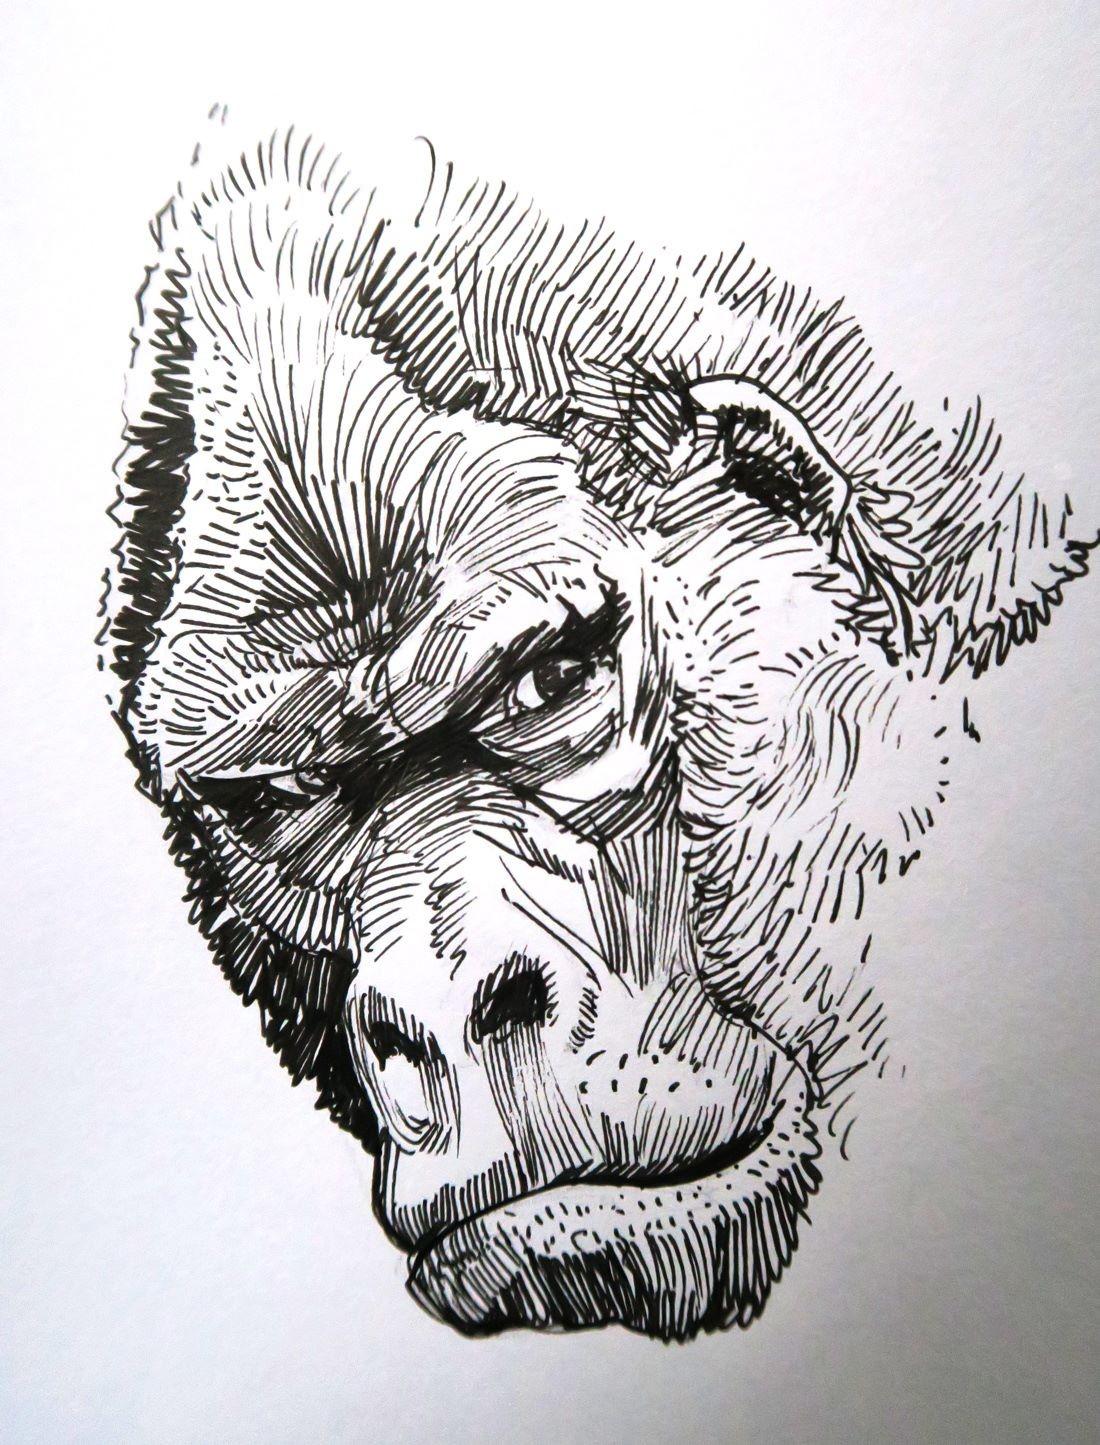 Hugo puzzuoli gorille face